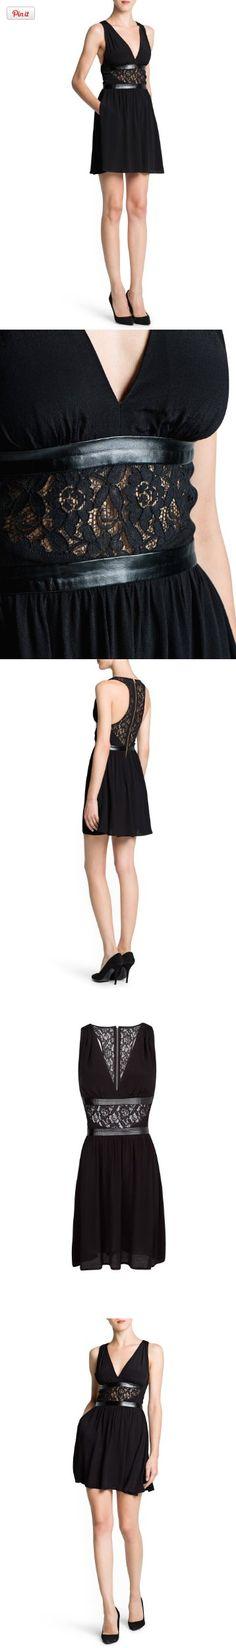 12202516a9689f Mango Women s Lace Appliqué Flowy Dress